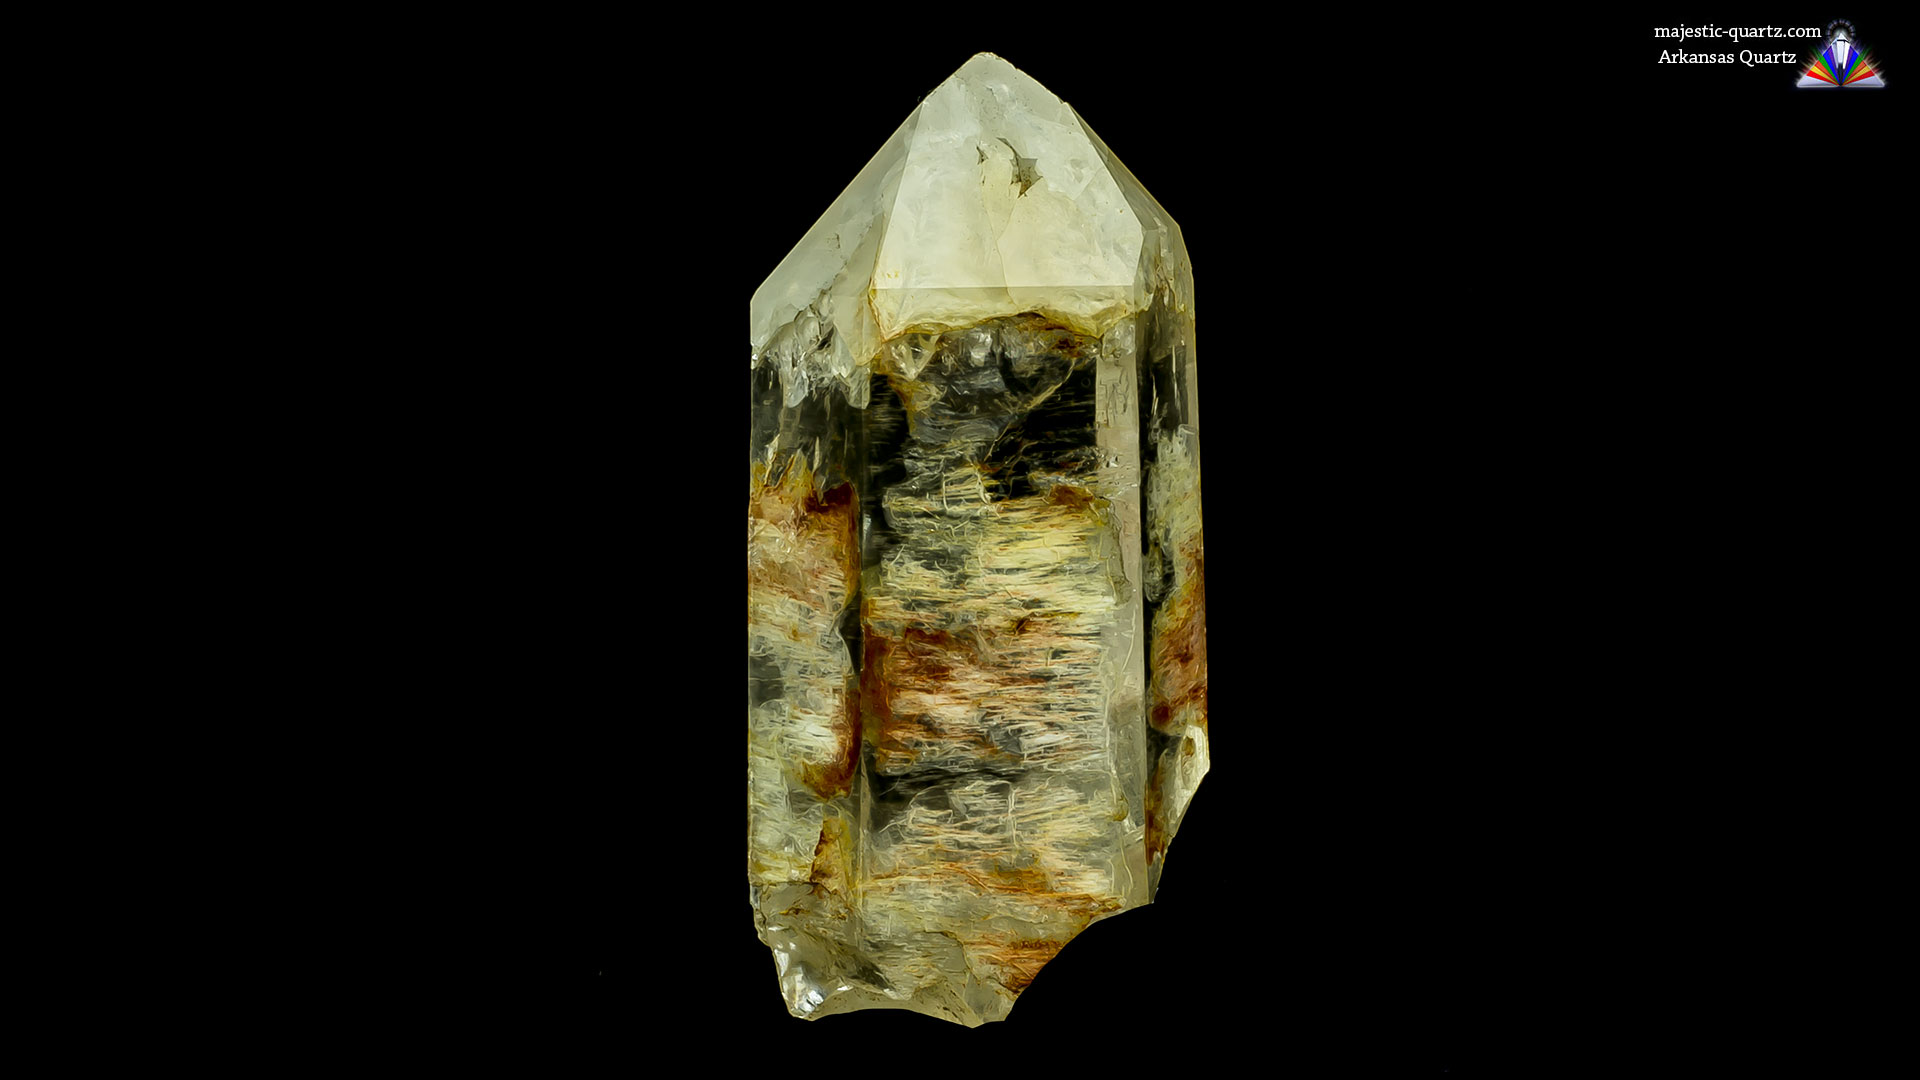 Arkansas Quartz Crystal - Photograph By Anthony Bradford